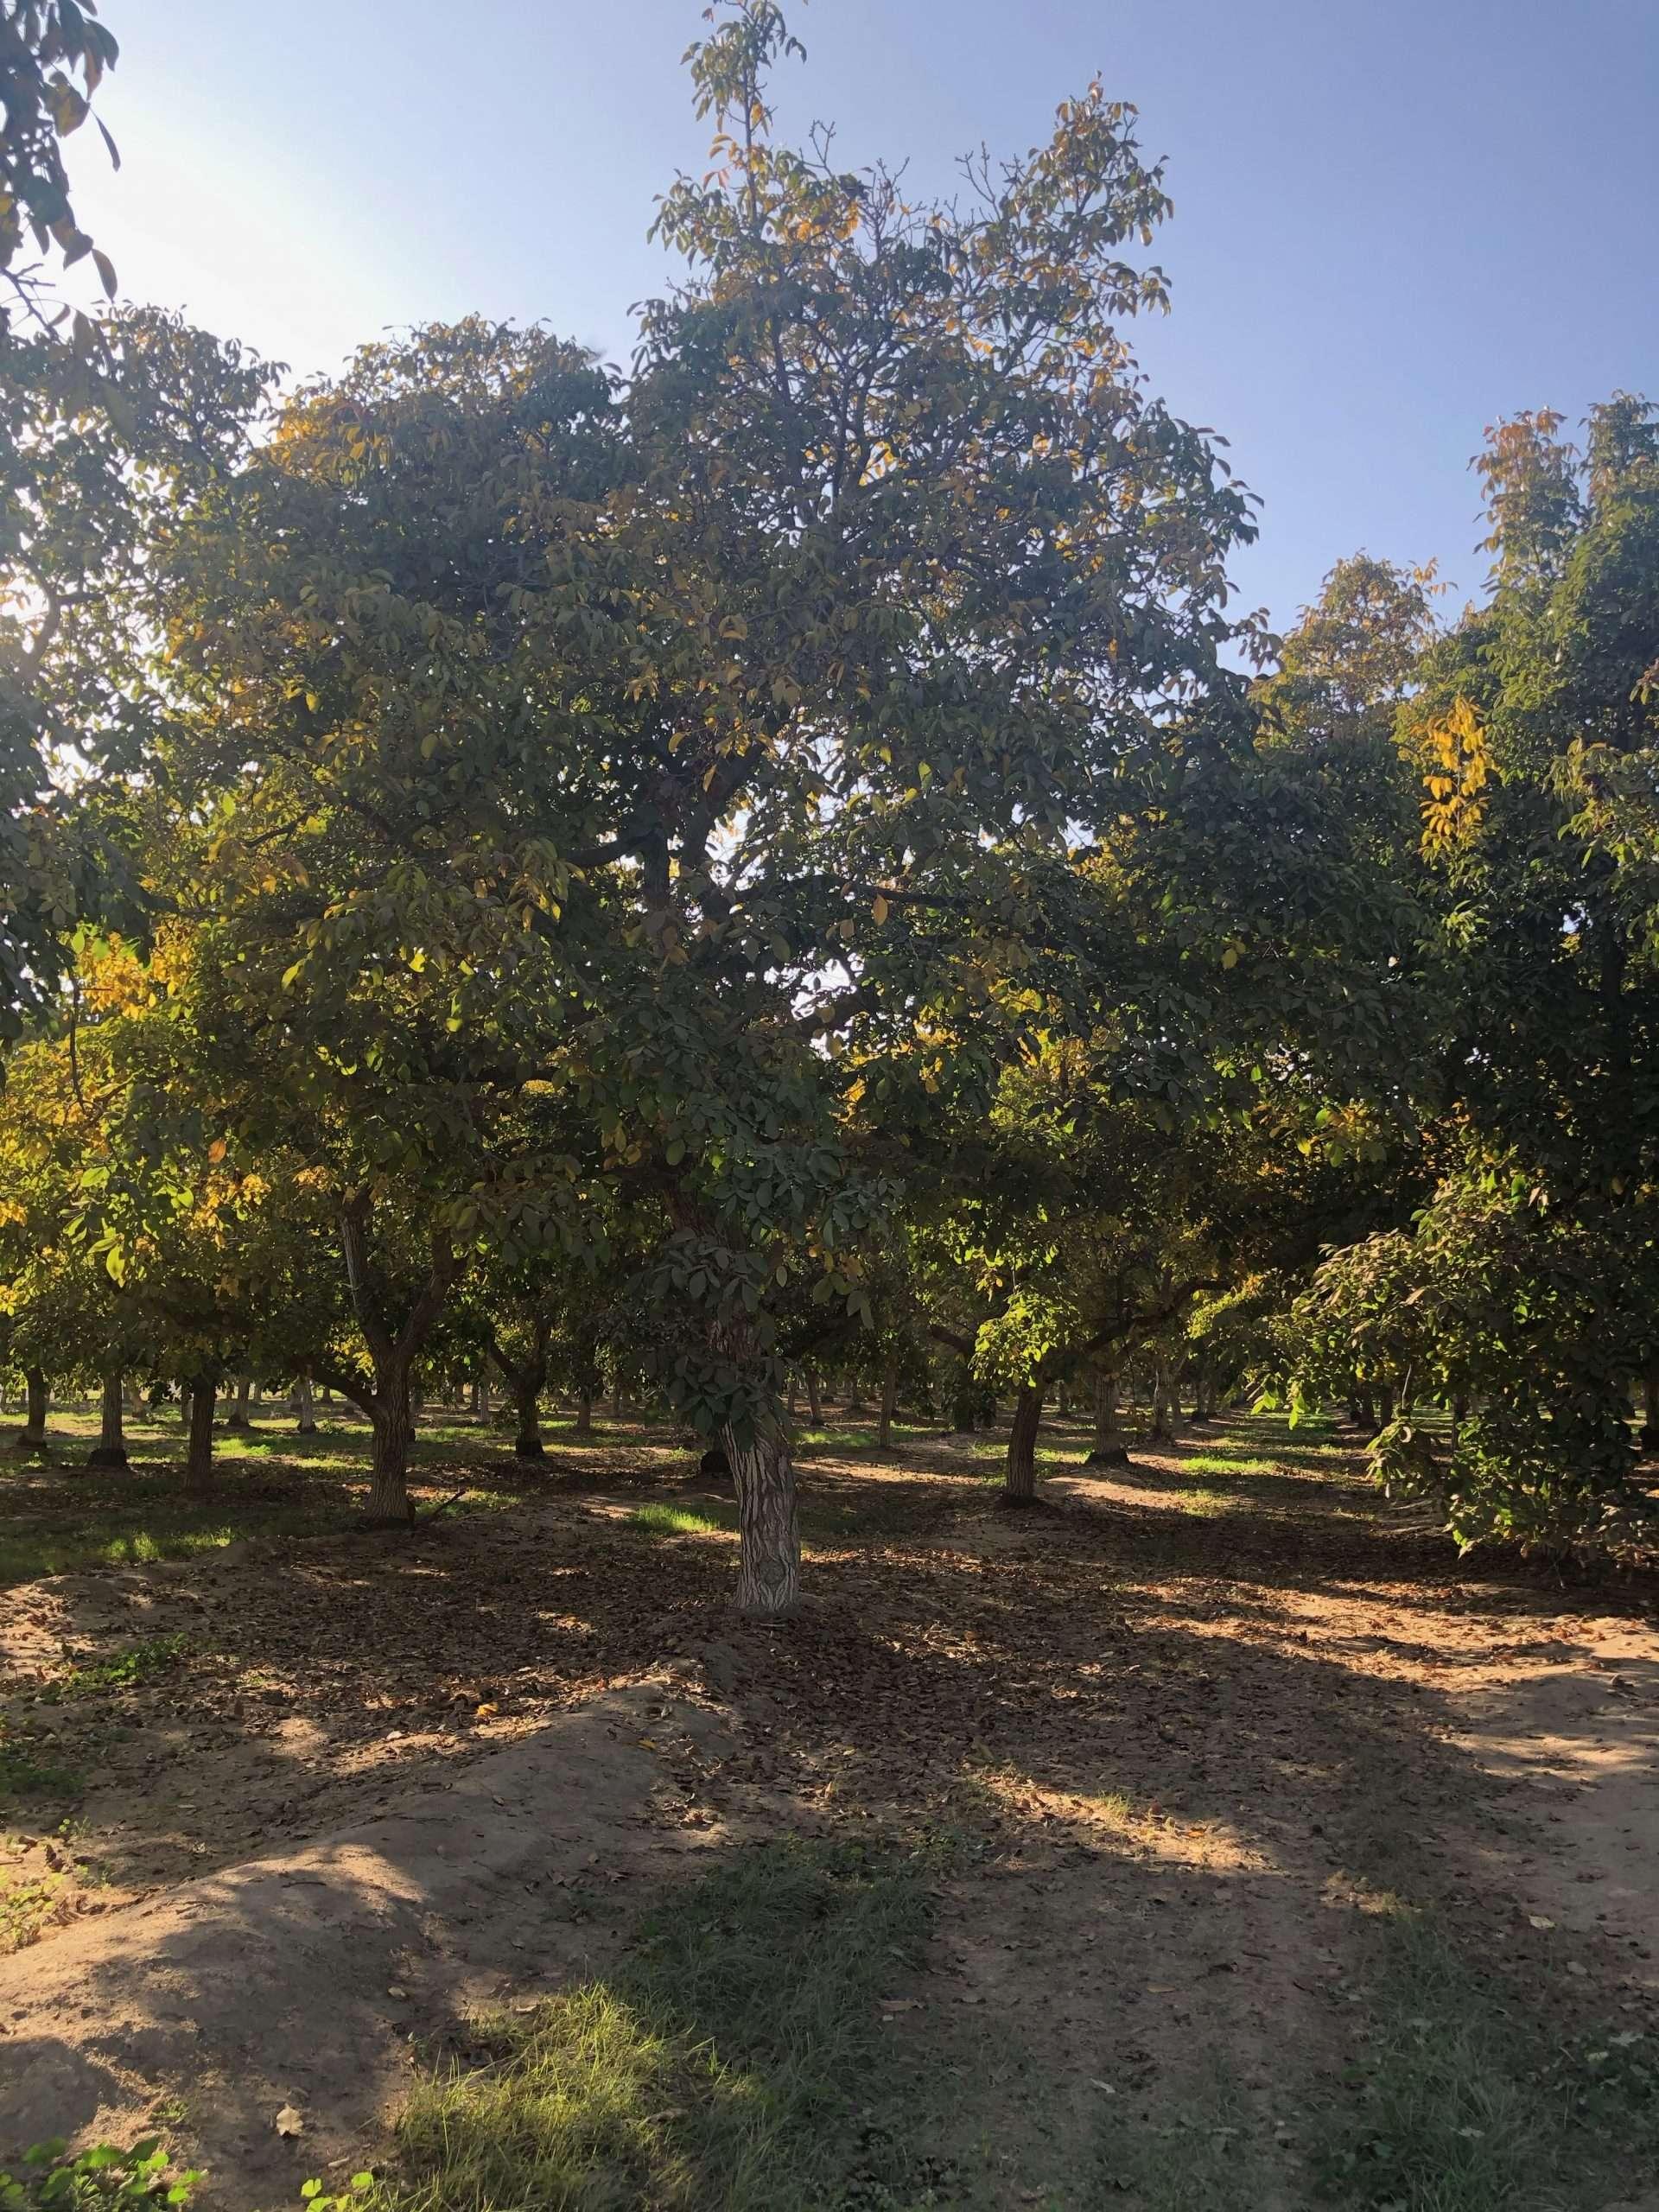 38.79 Acres Walnuts Woodville, CA